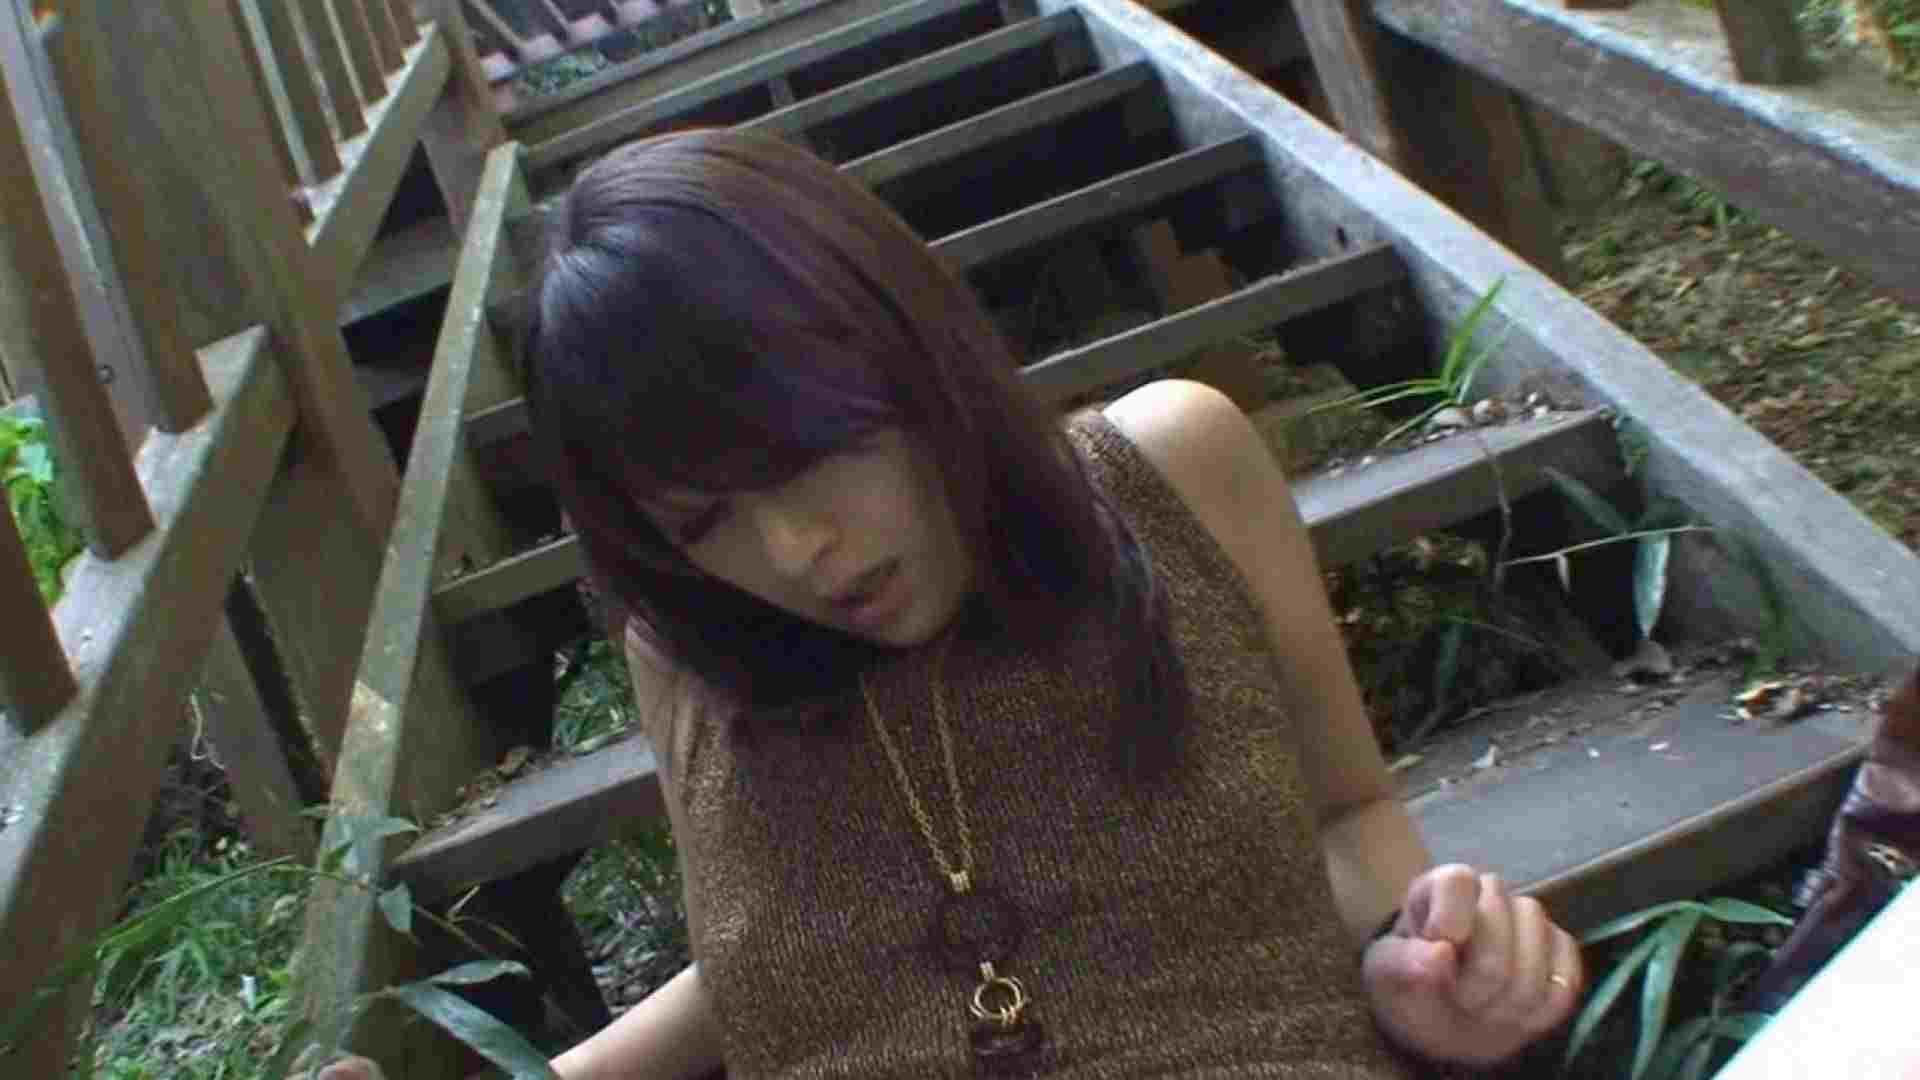 S級厳選美女ビッチガールVol.03 ナース 覗き性交動画流出 80画像 31